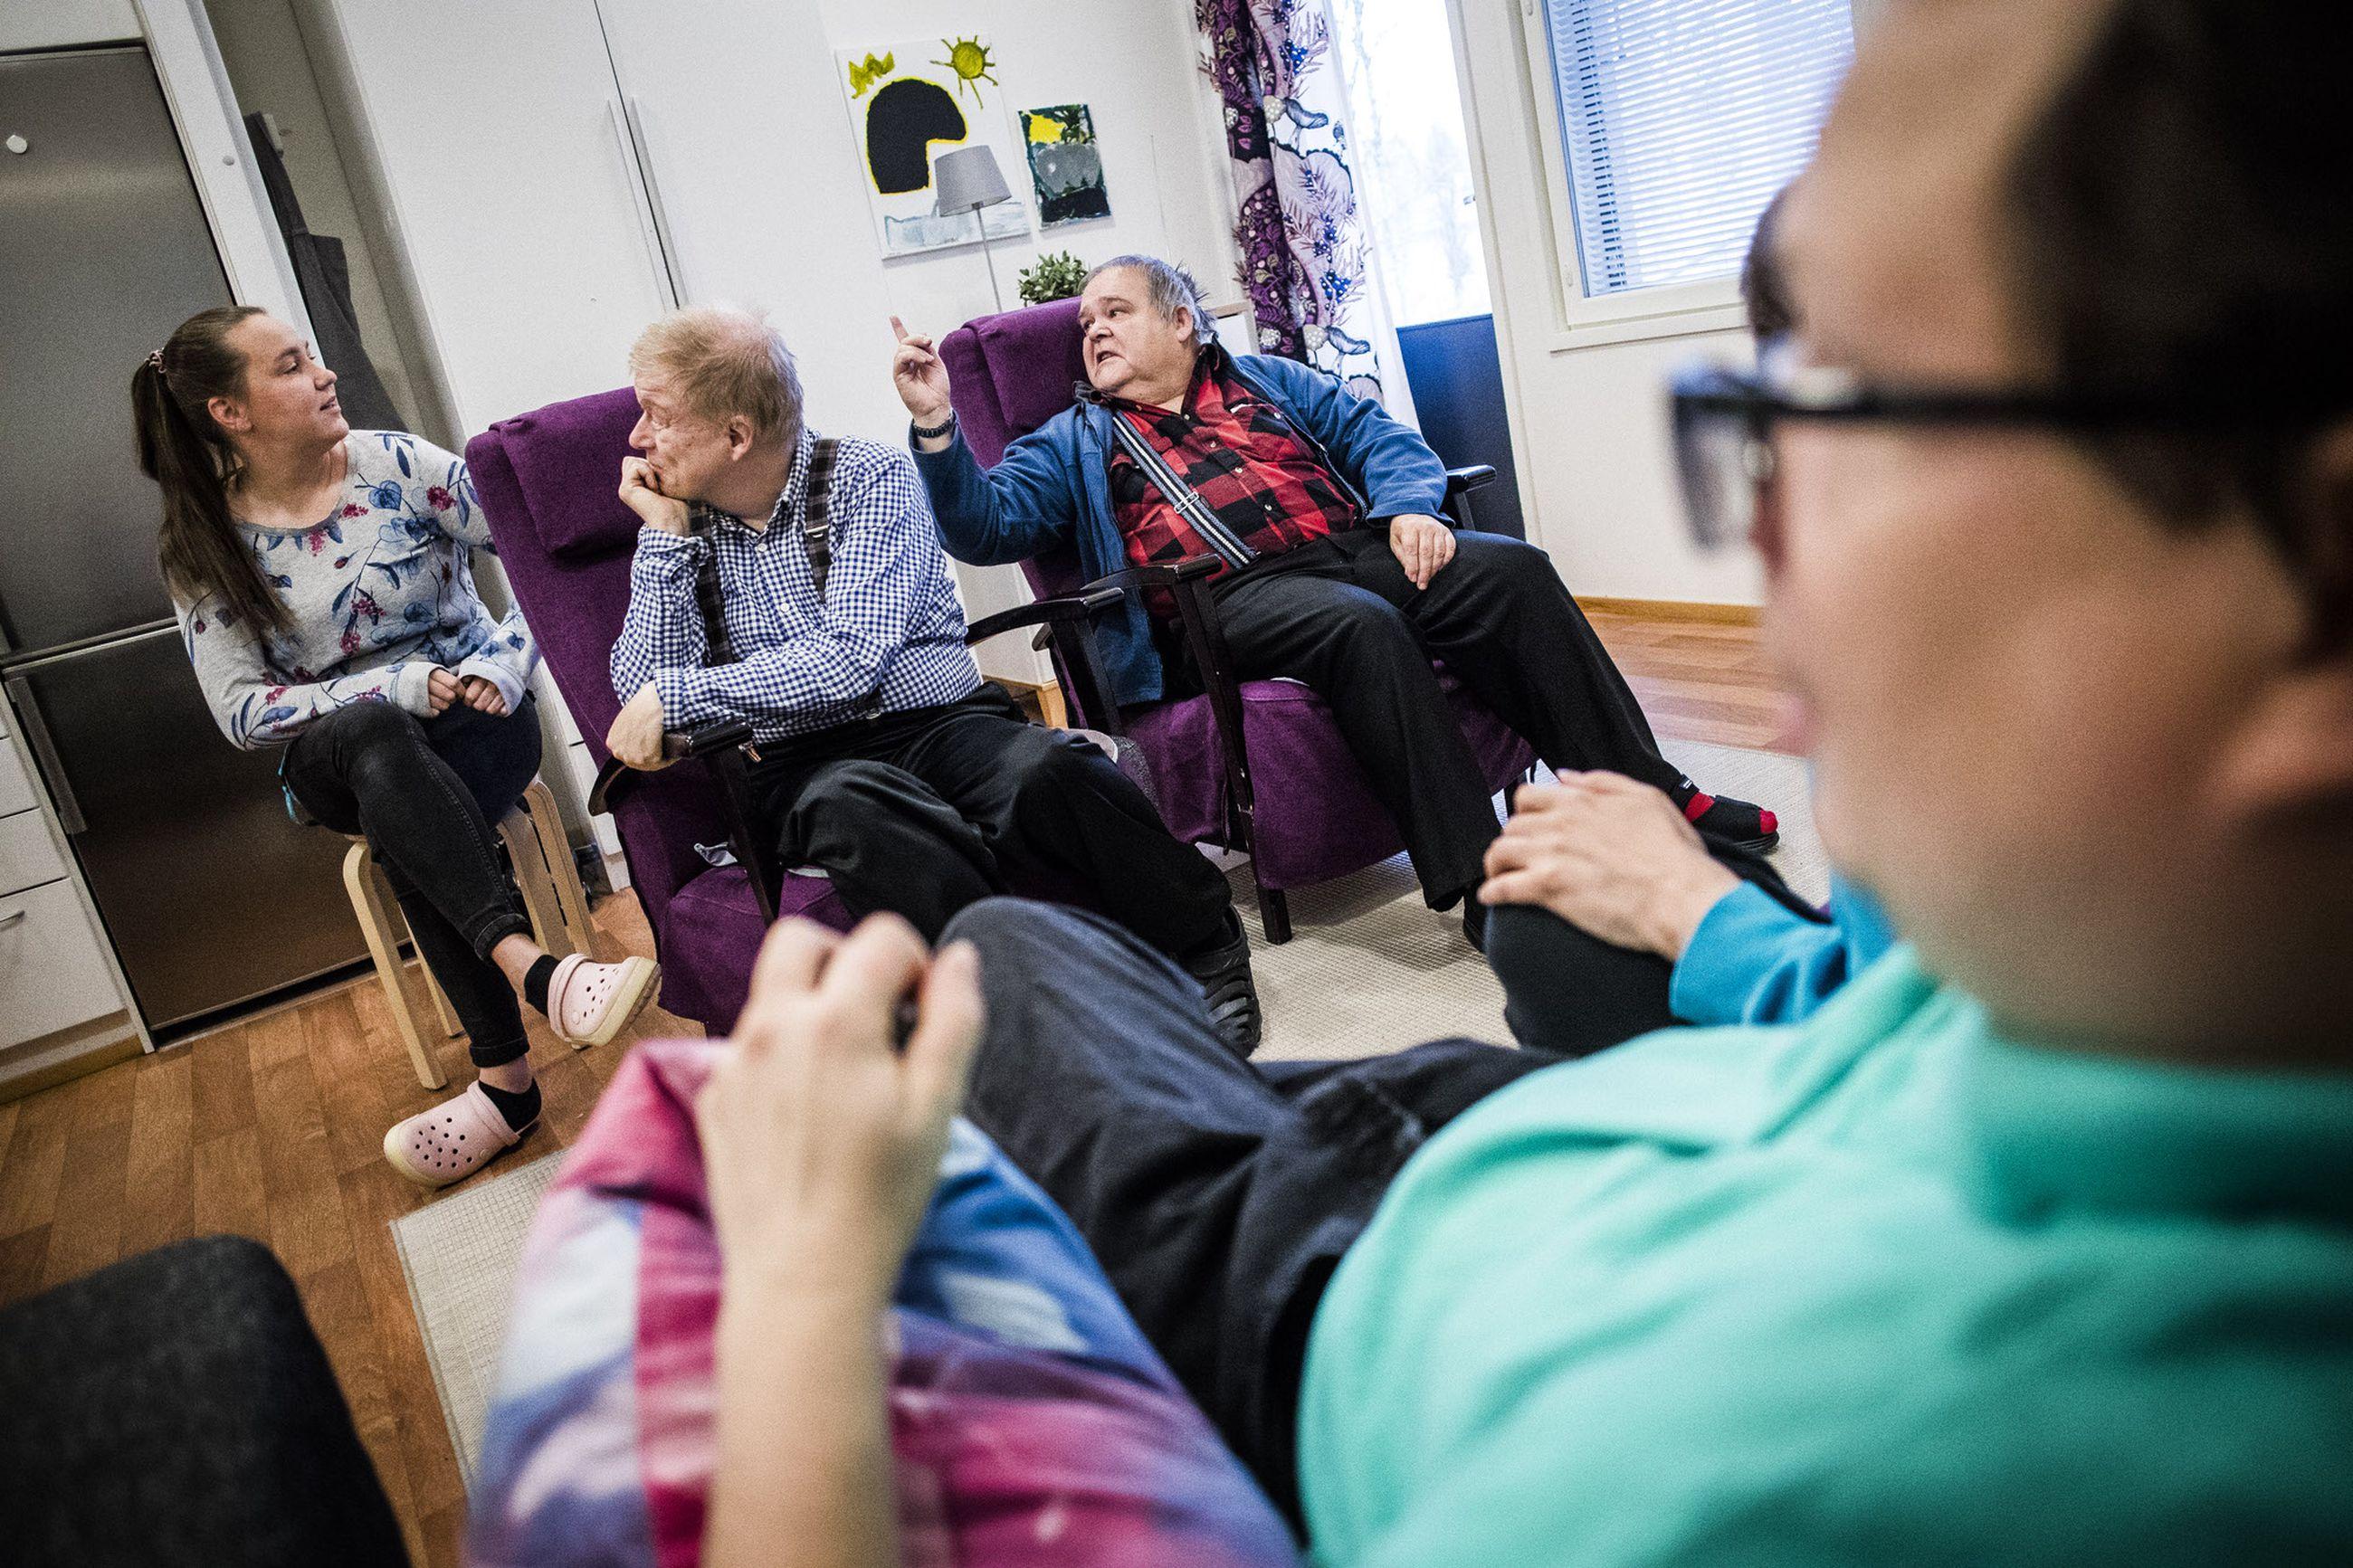 Matkapalvelukeskus Rovaniemi